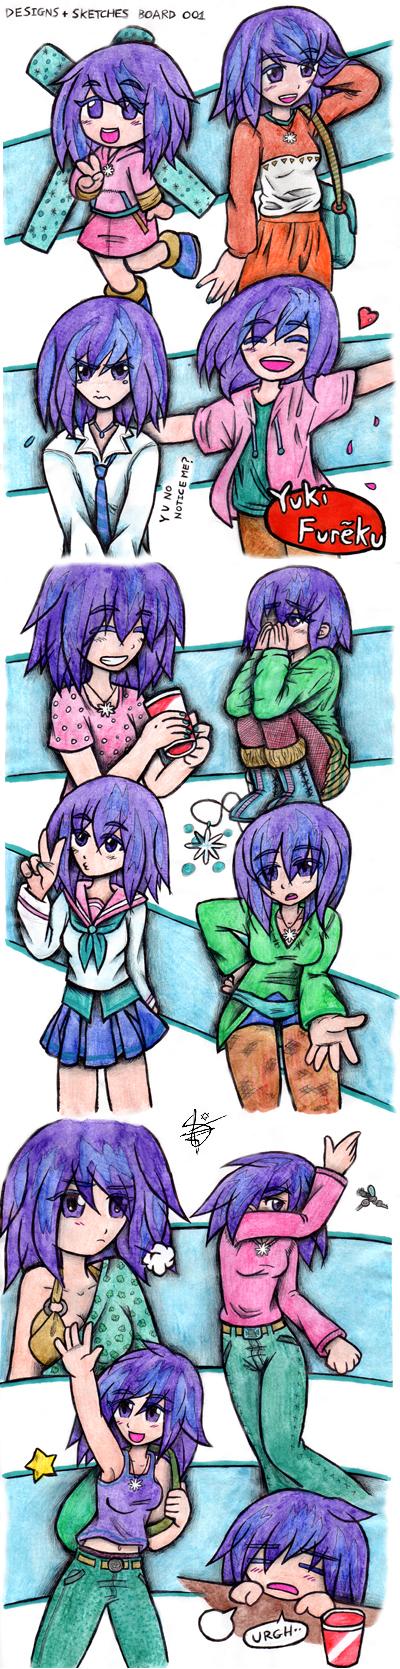 Sketches and Designs 001 by daaku-no-tenshi